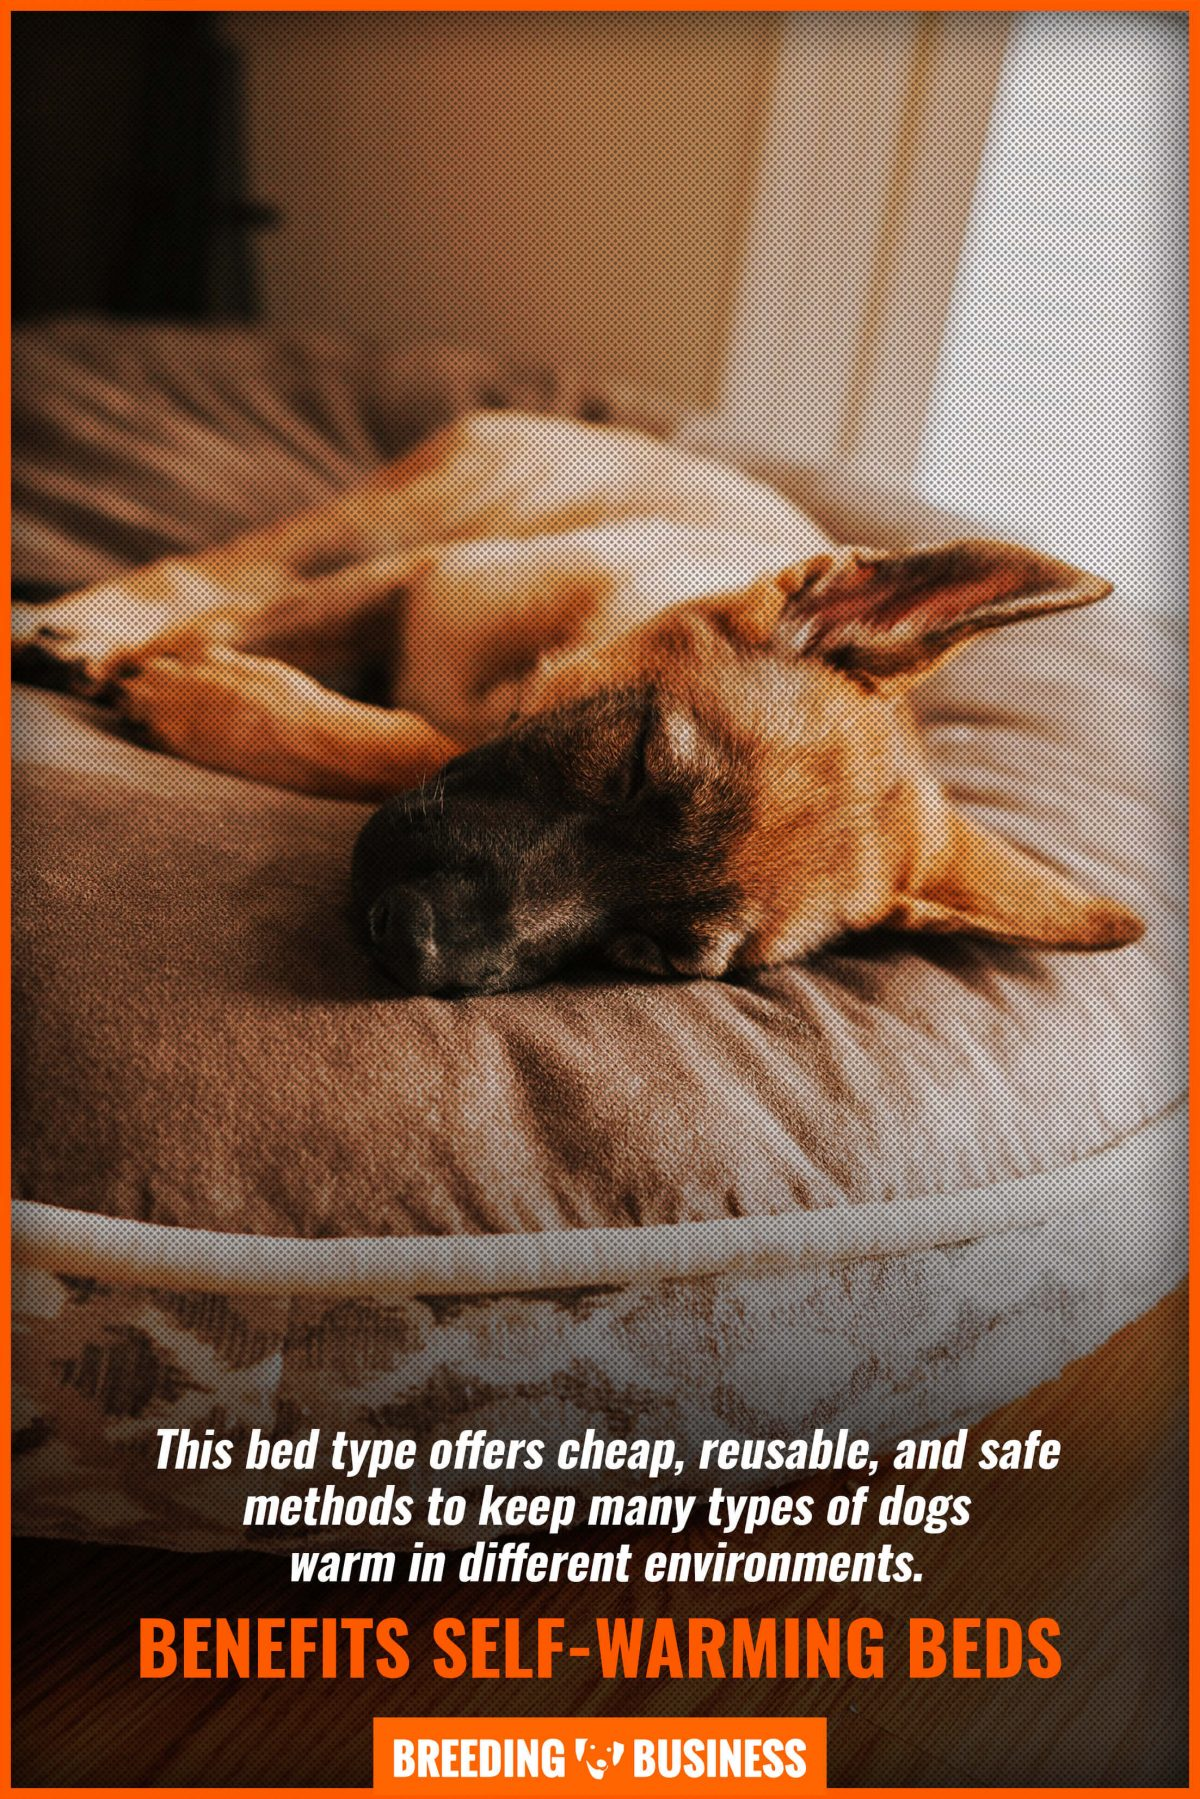 benefits self-warming beds